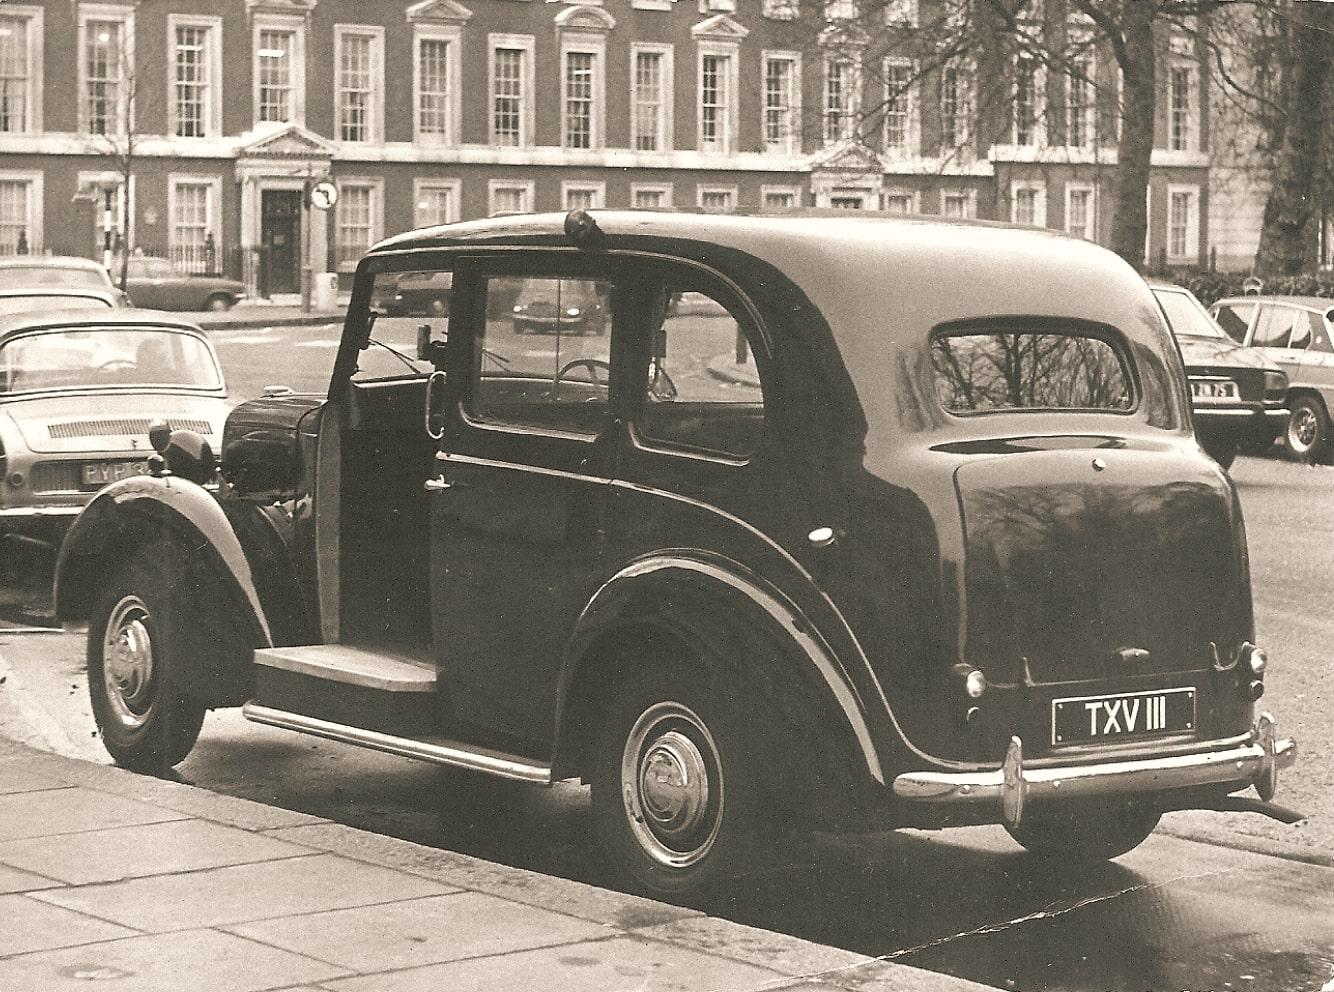 Такси Лондона, 1970-е.